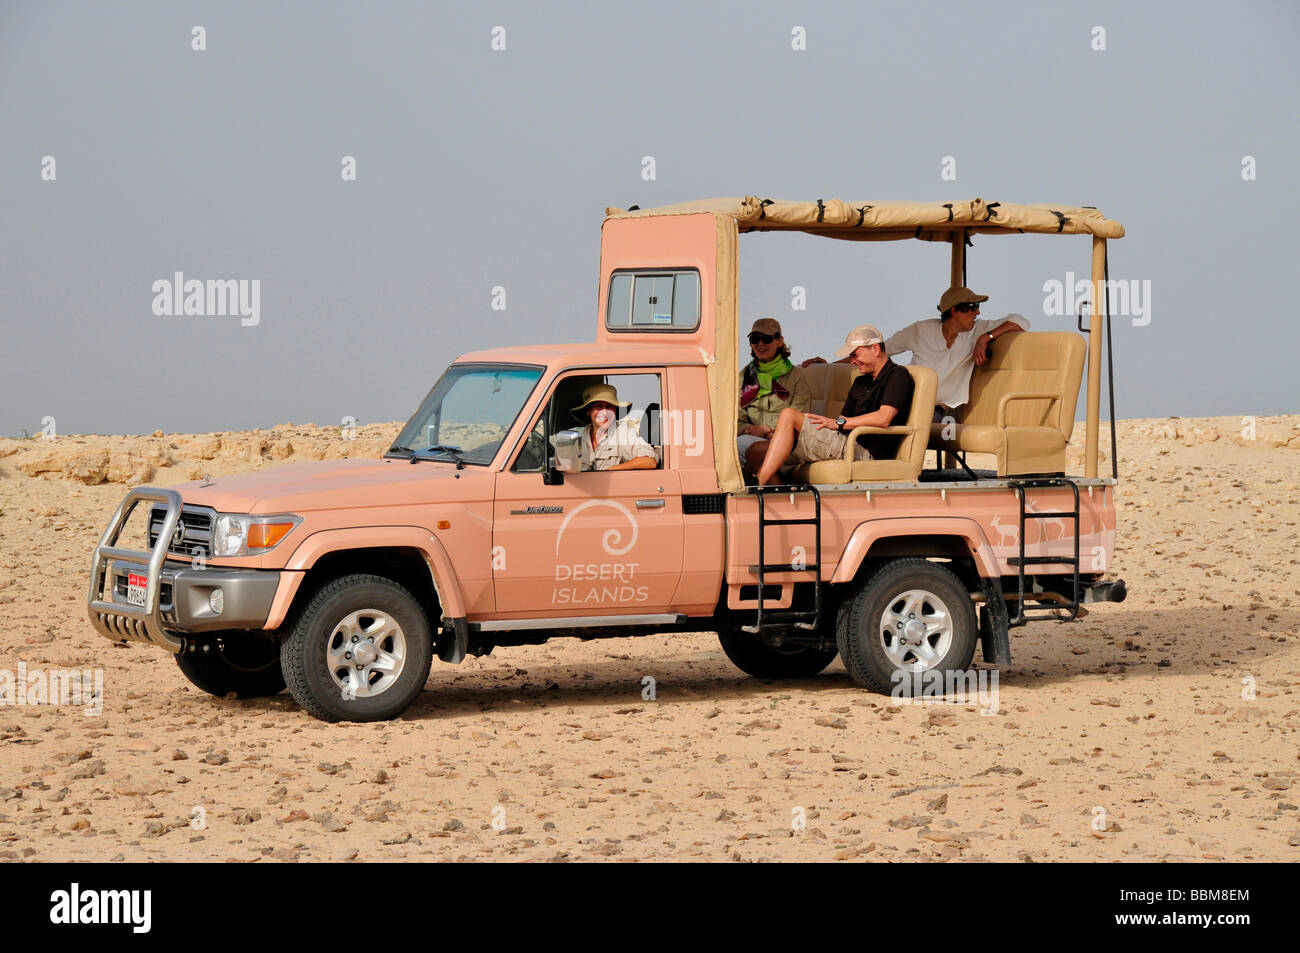 Safari-vehicle, tourists, Sir Bani Yas Island, Abu Dhabi, United Arab Emirates, Arabia, Near East, Orient - Stock Image